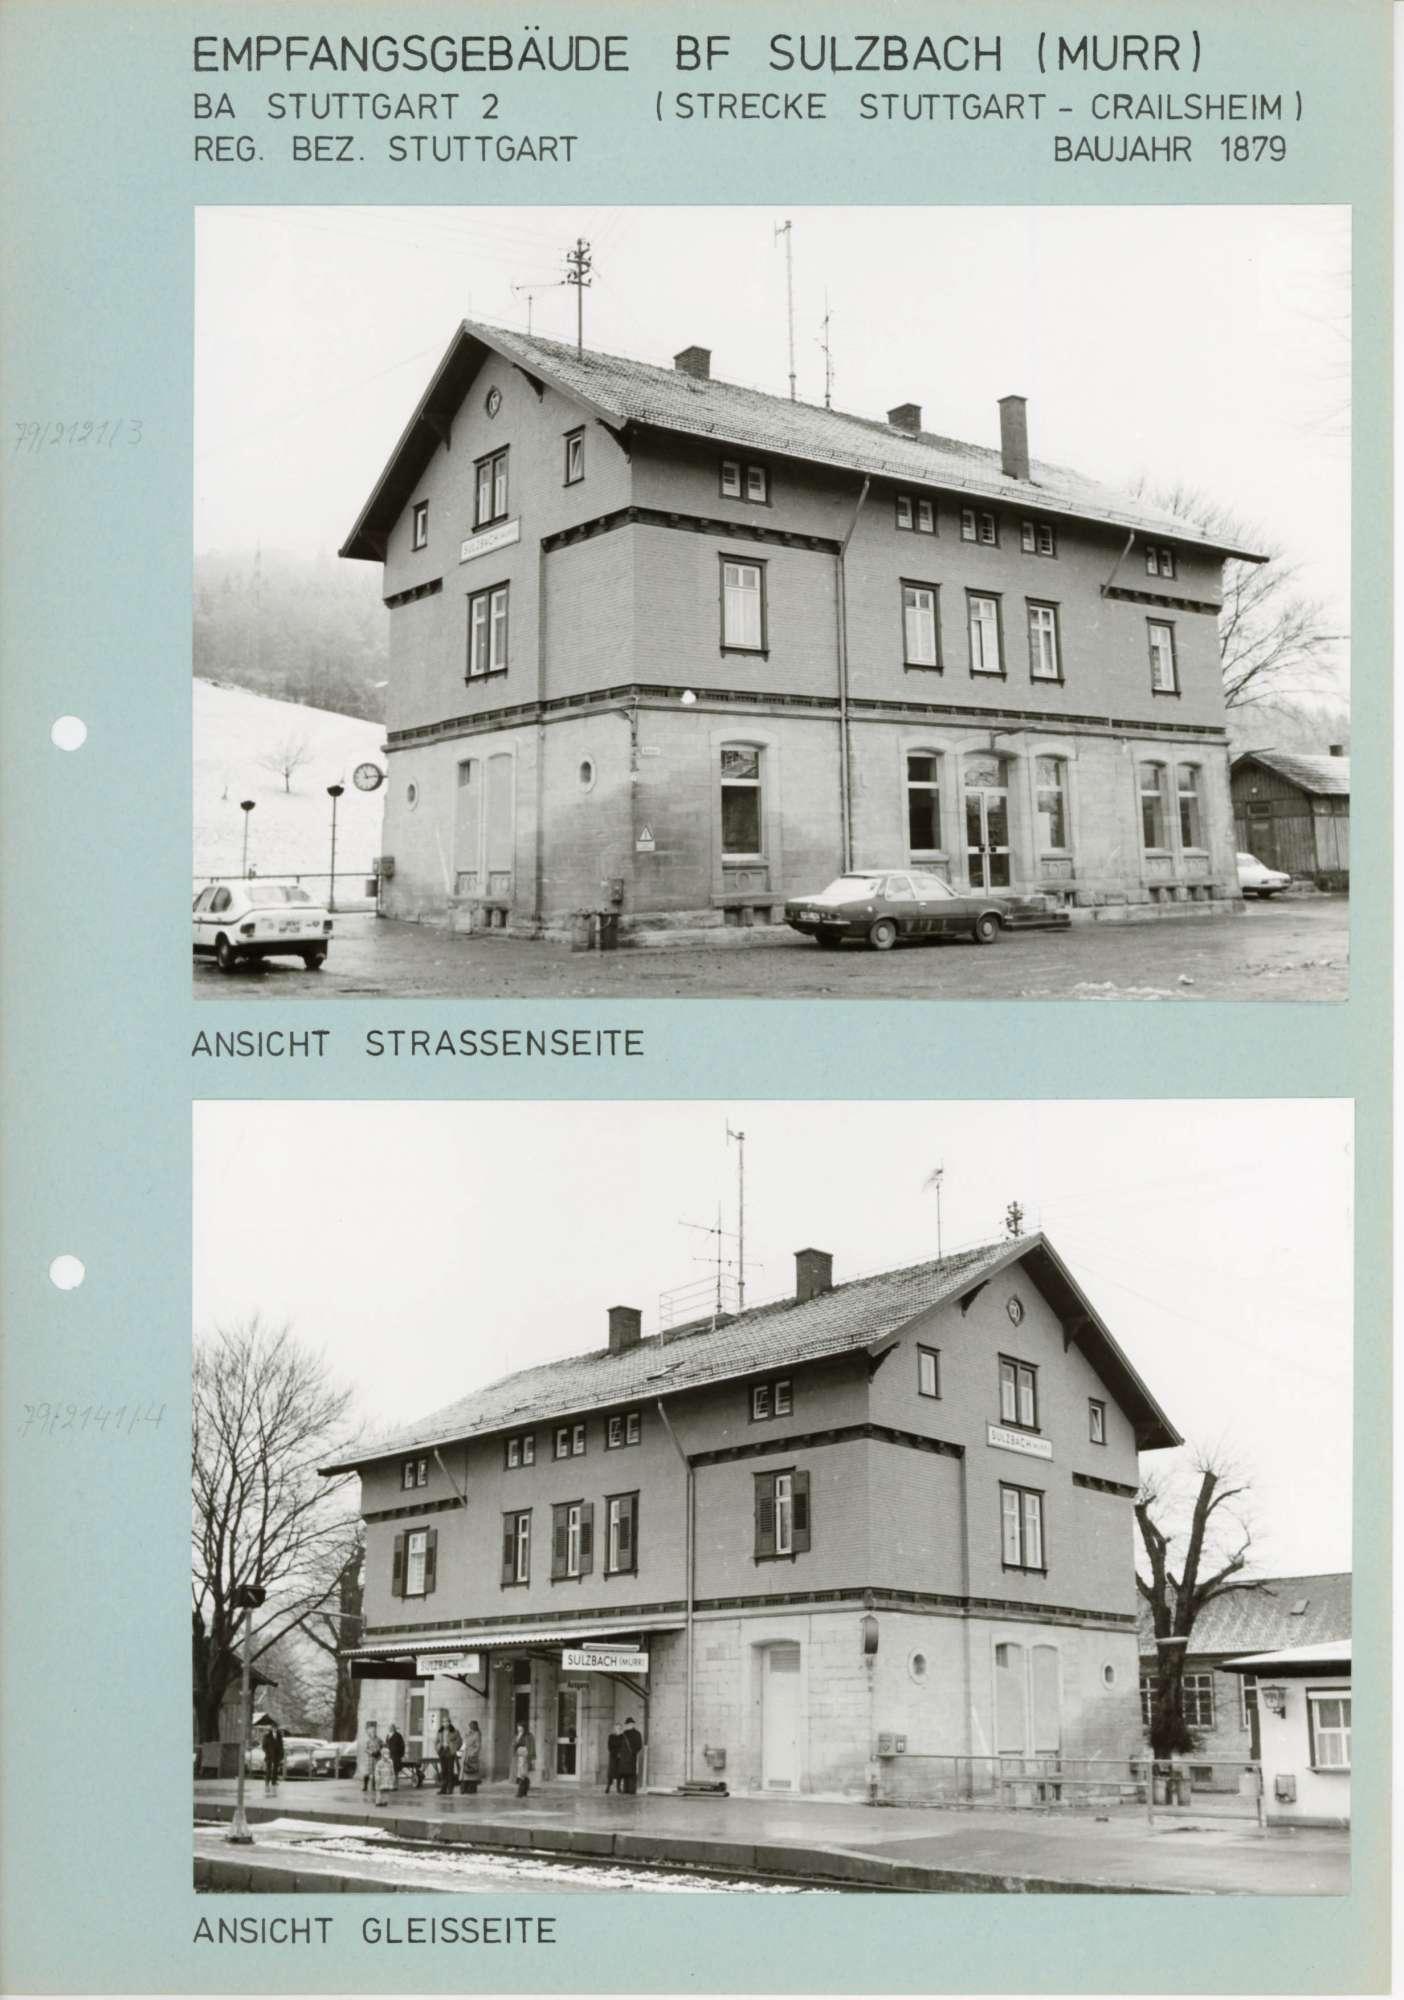 Sulzbach an der Murr: 7 Fotos, Bild 2